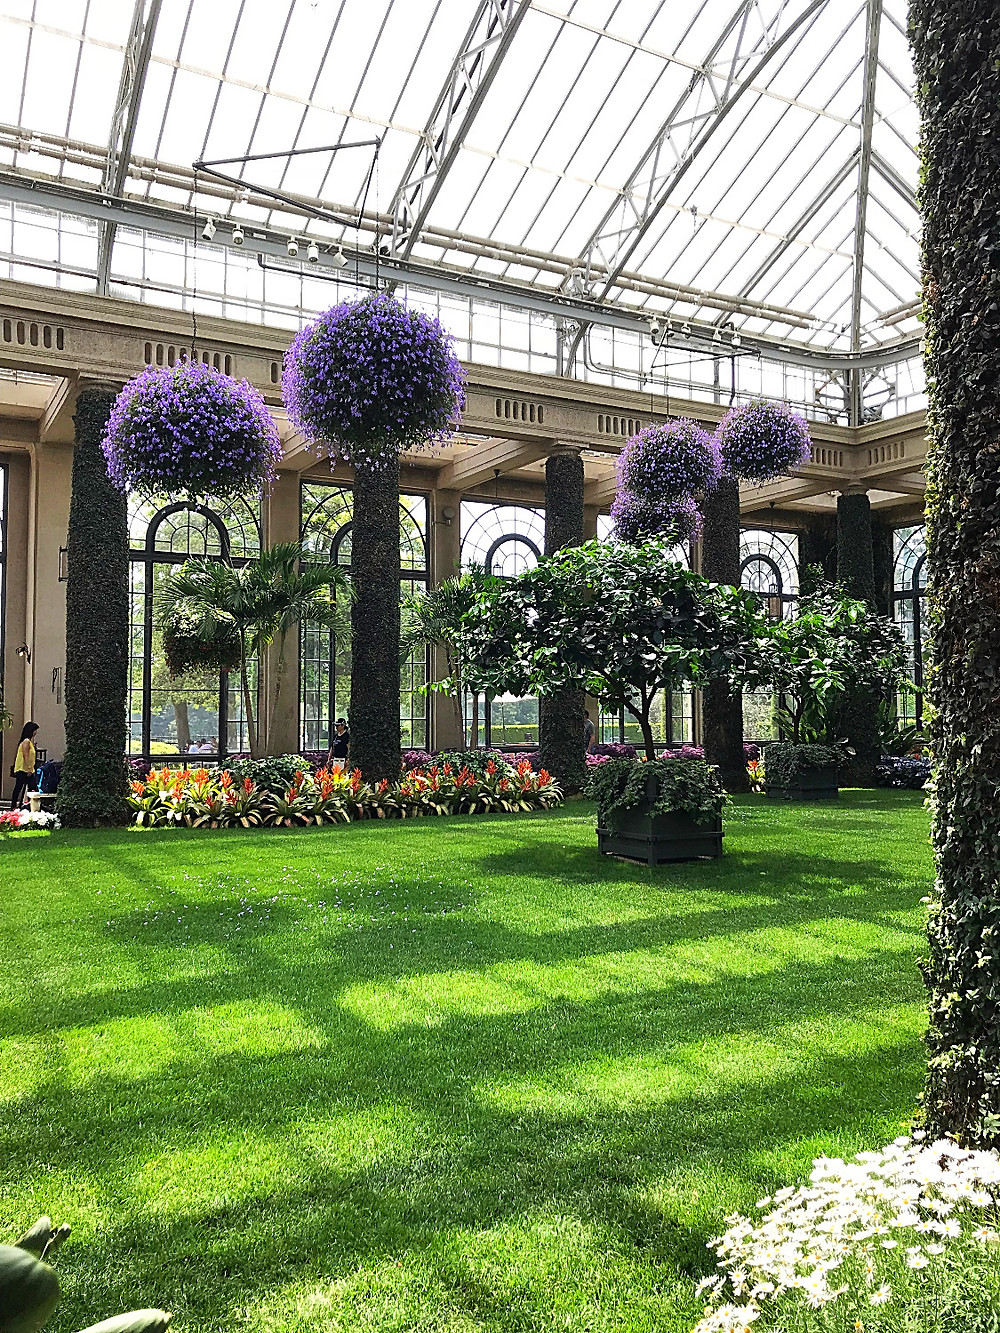 Curious G and Me, Longwood Gardens, topiary garden, children's garden, Philadelphia, Philadelphia gardens, Philadelphia with kids